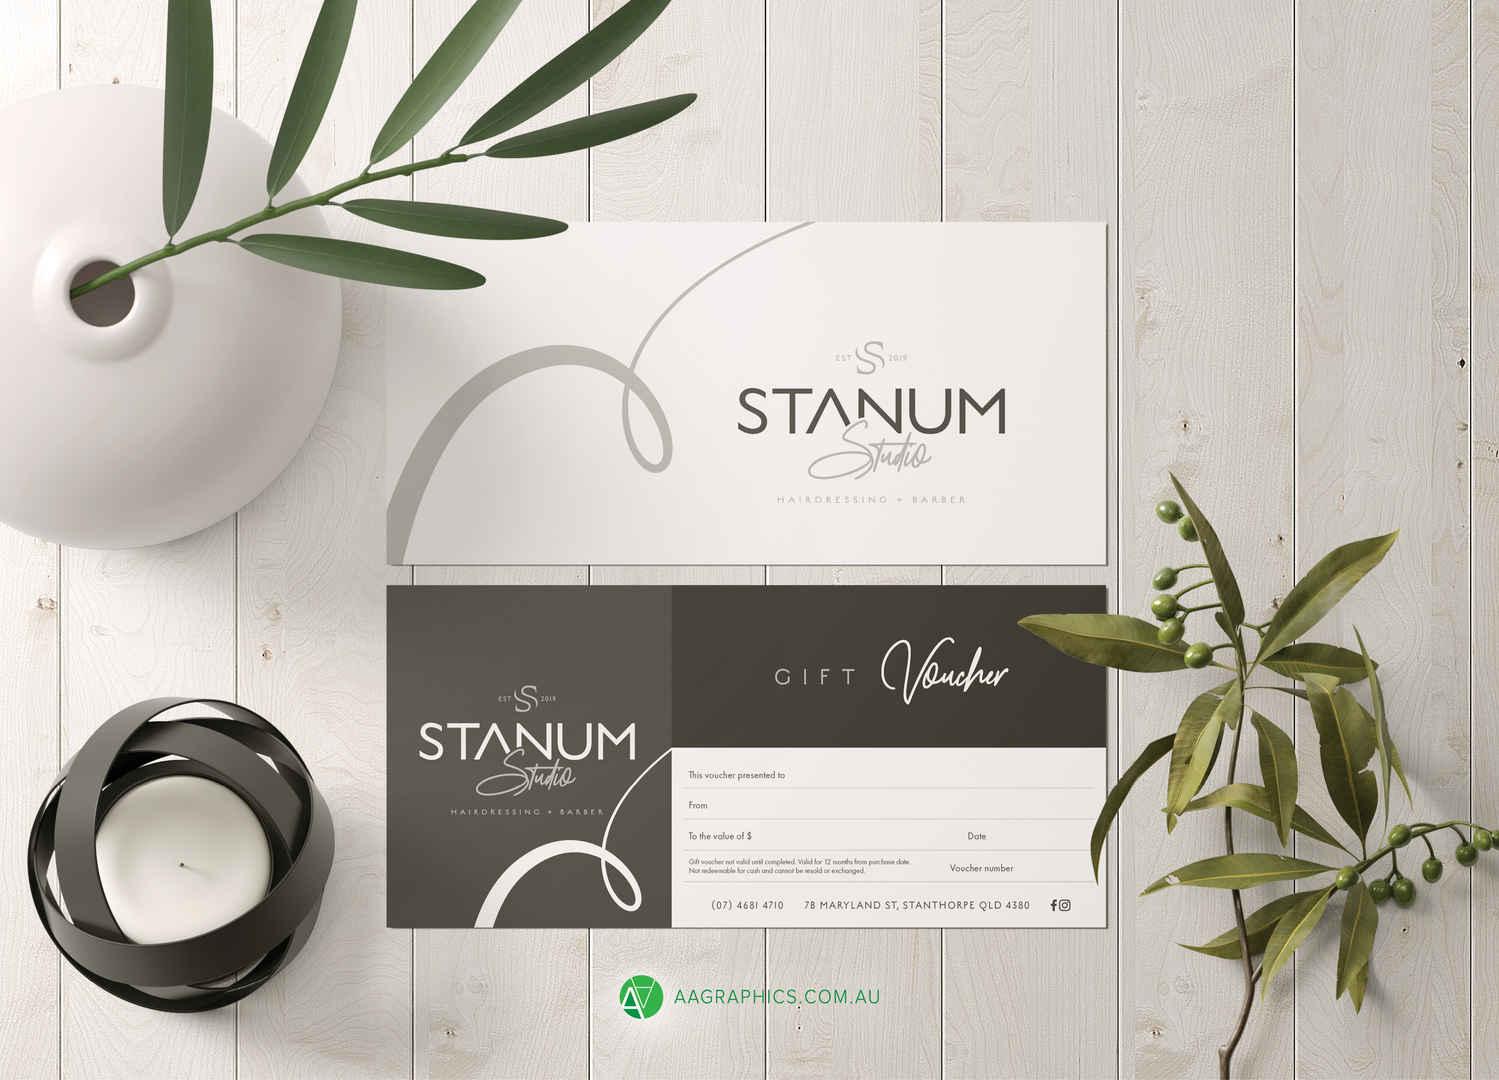 Stanum Studio_Voucher.jpg